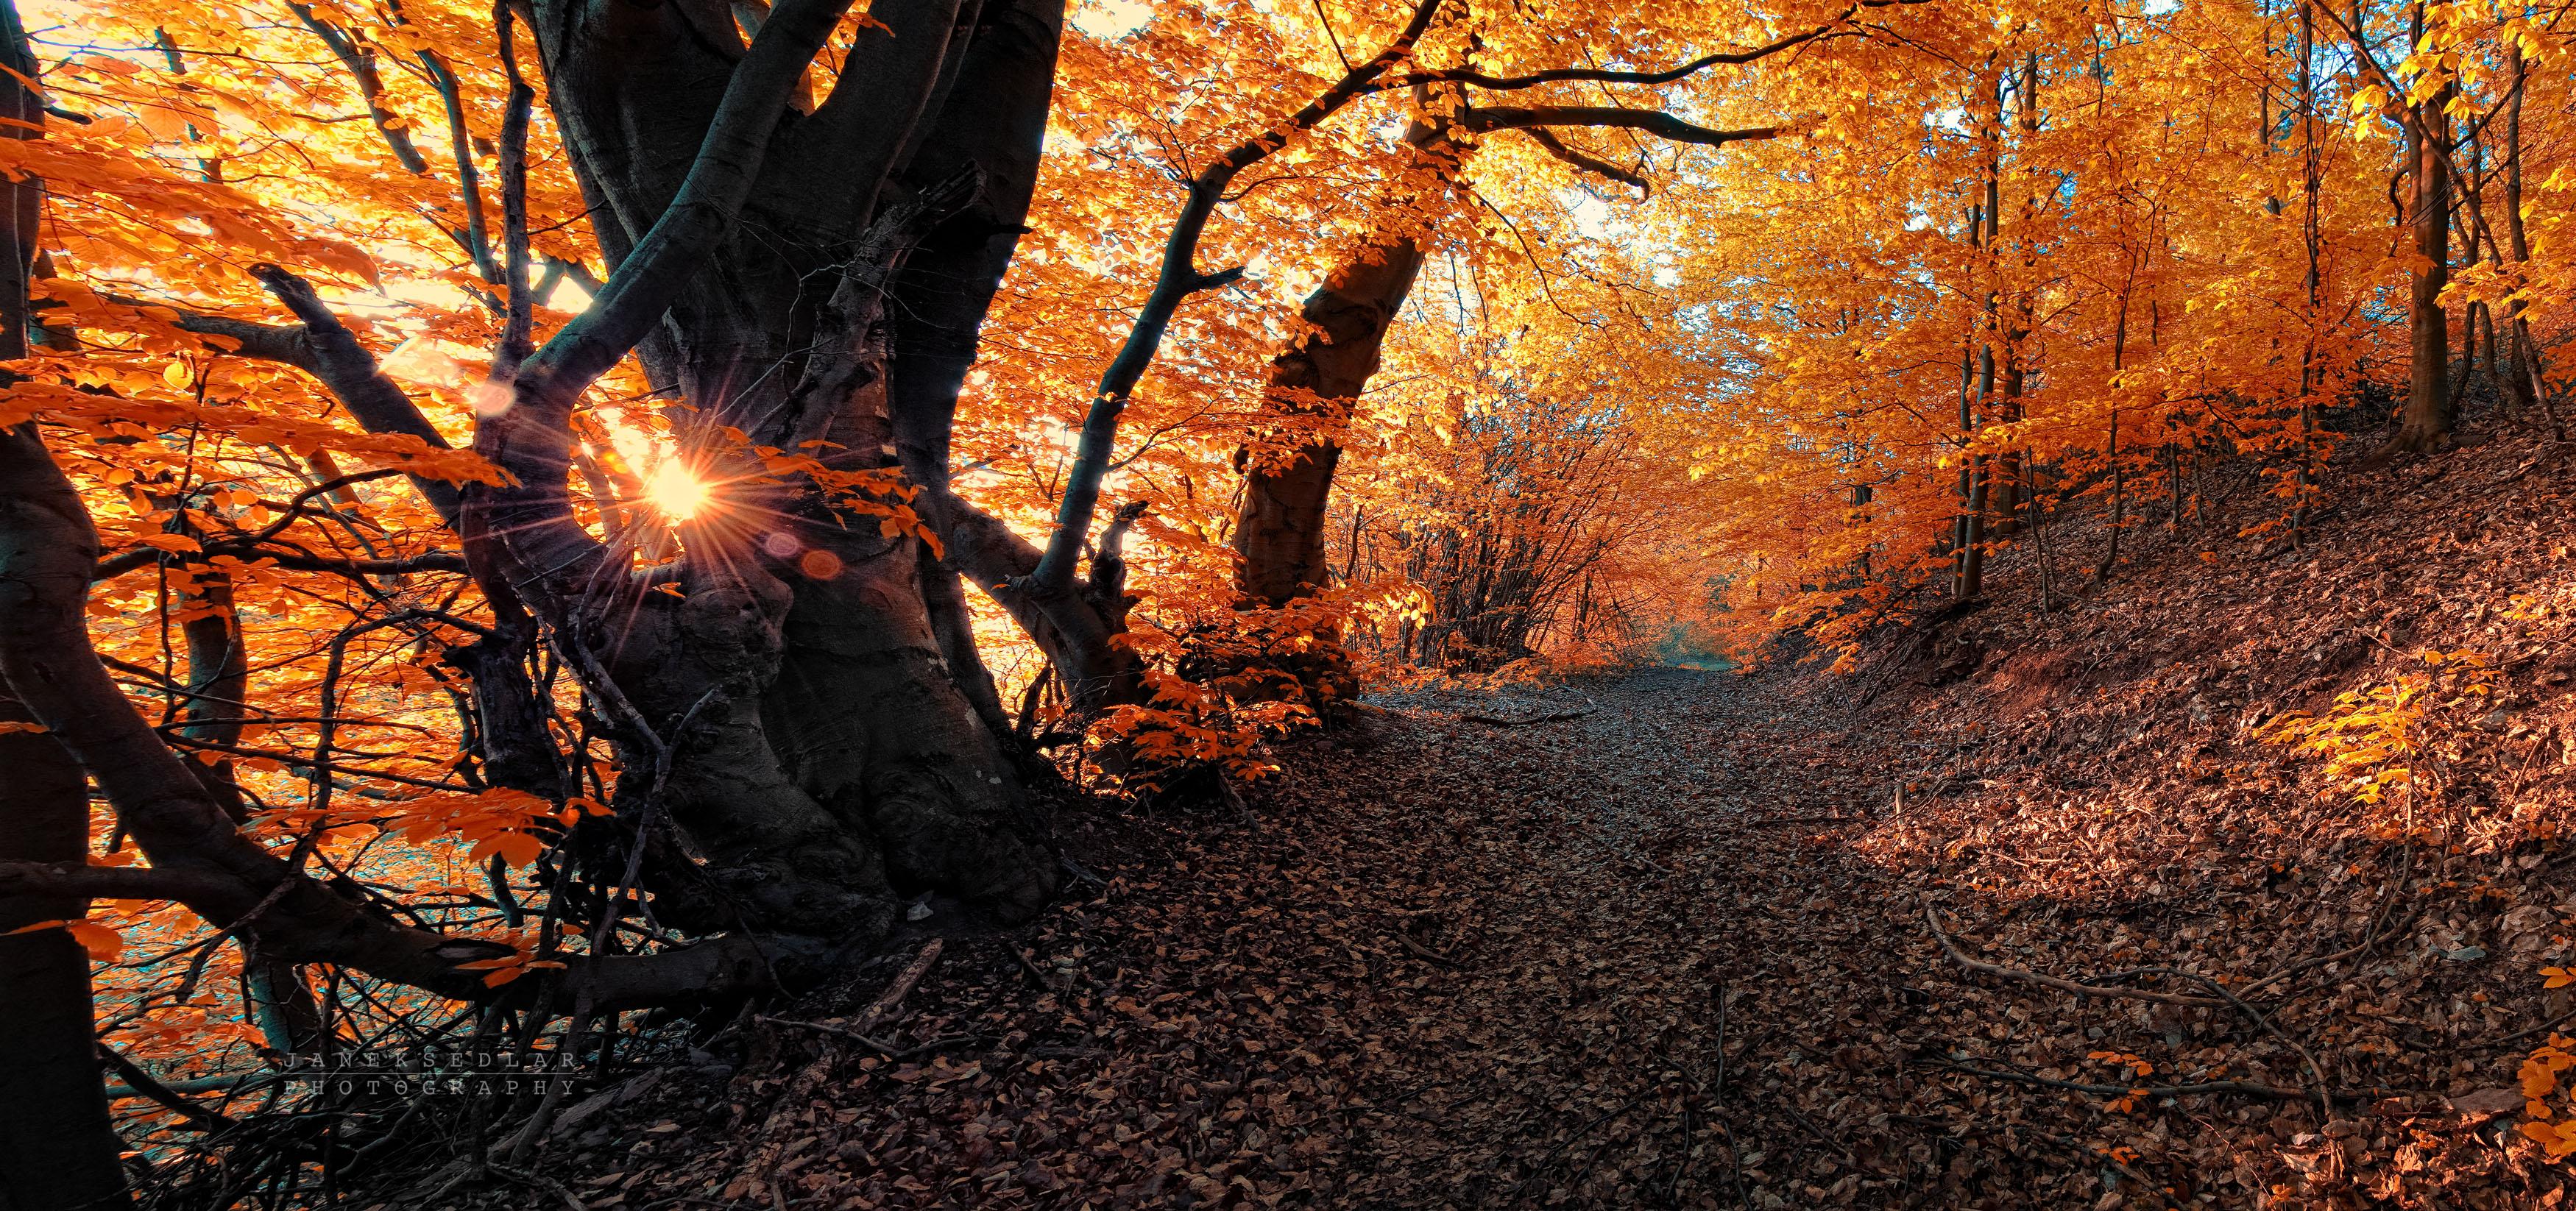 Fall Foliage Forest Path Sunset Orange Color 3500x1646